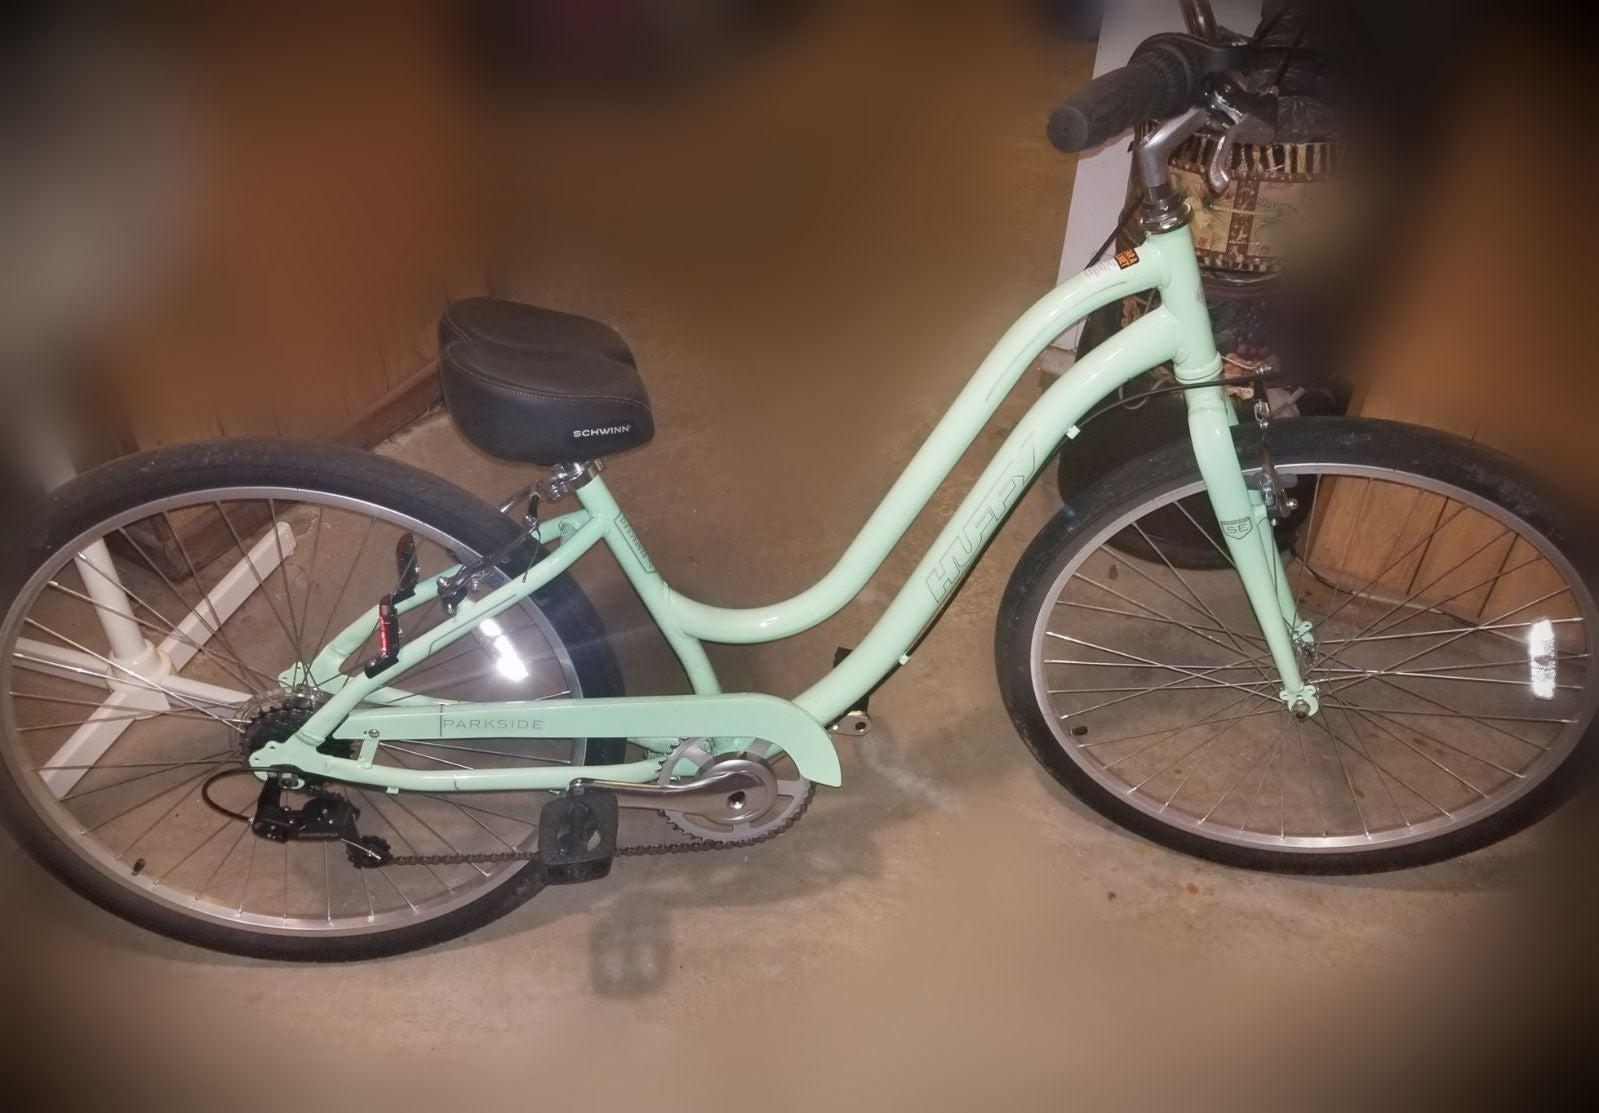 27.5 Huffy Parkside bike and saddle seat